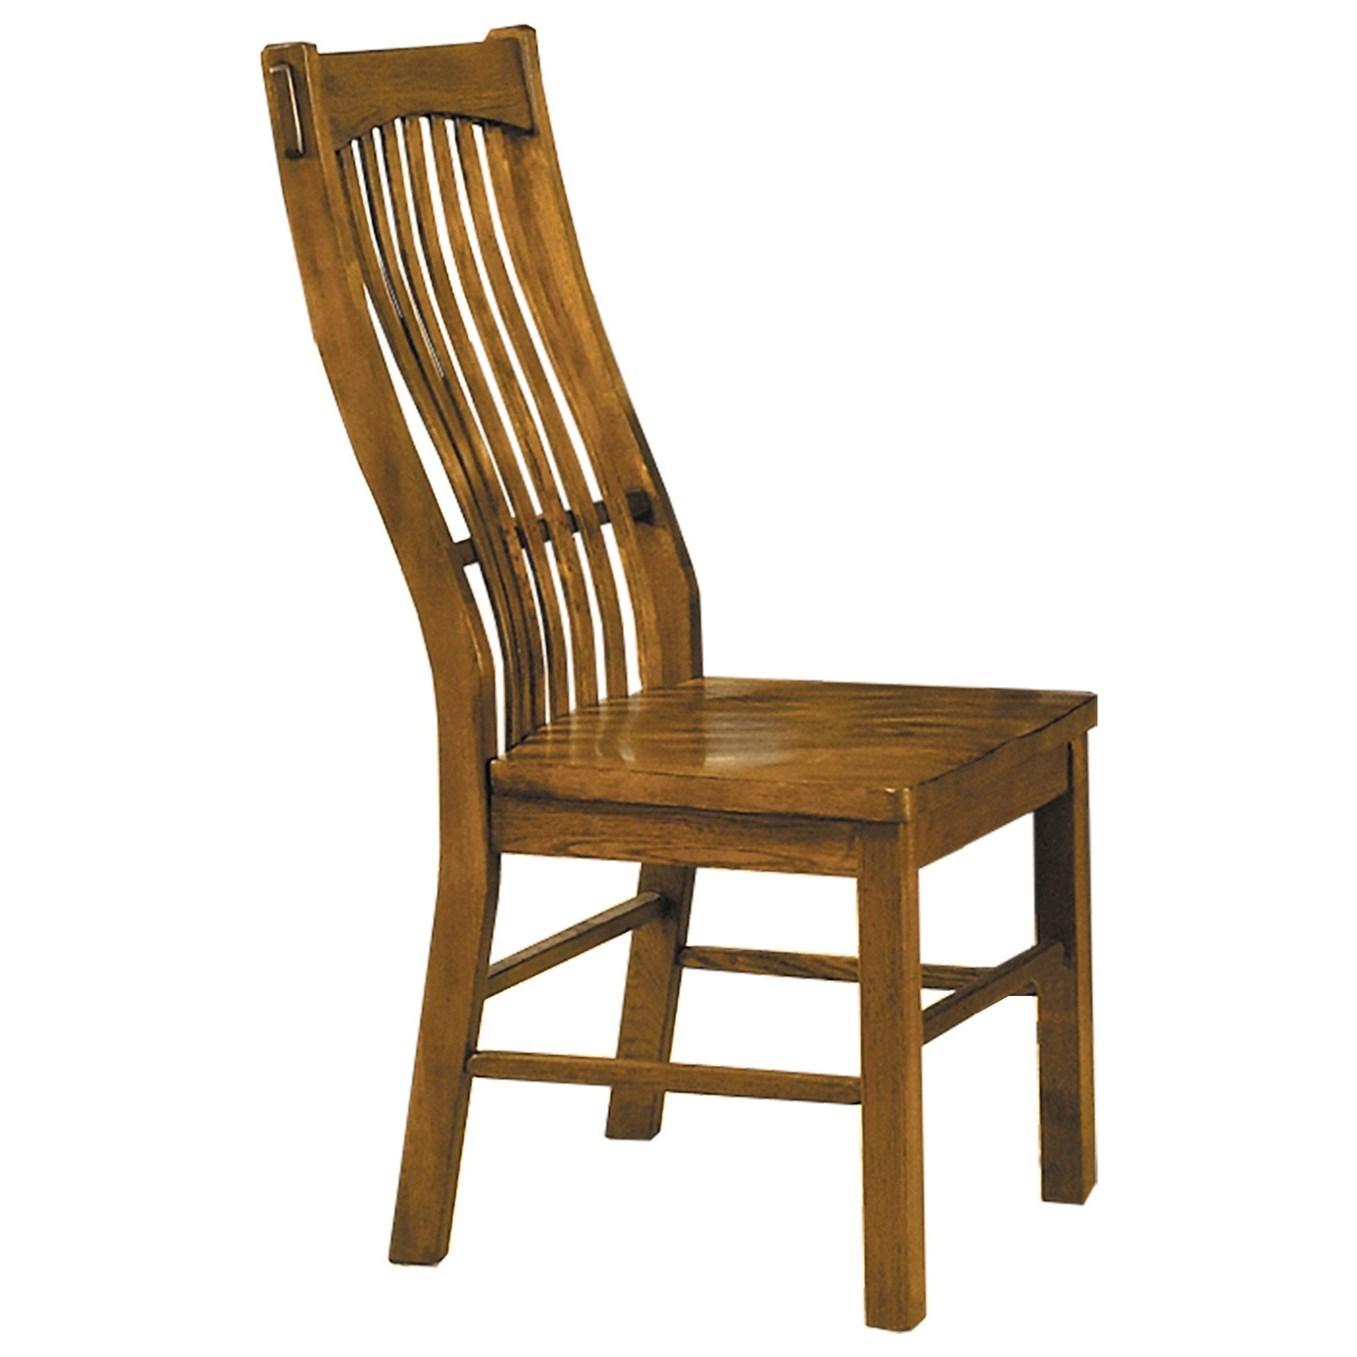 Laurelhurst Slatback Dining Chair  by A-A at Walker's Furniture